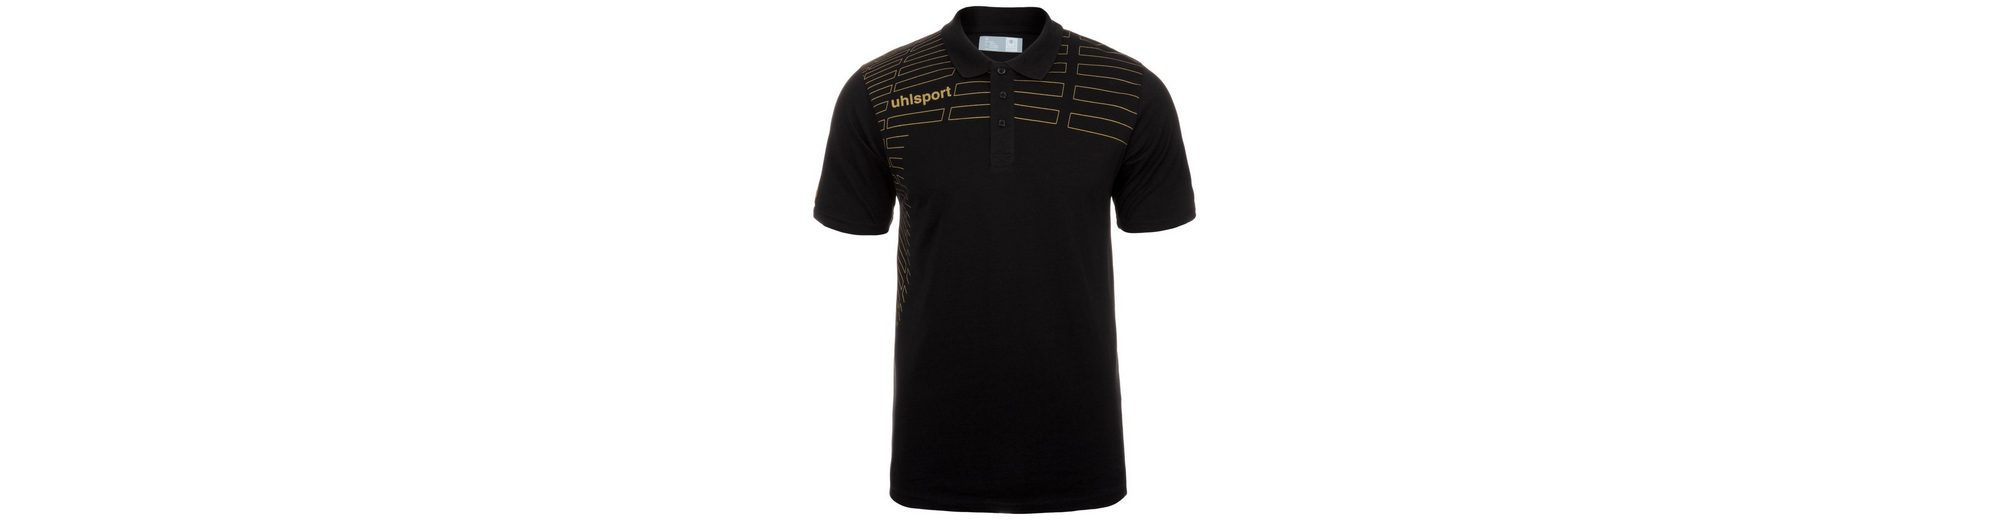 UHLSPORT Match Polo Shirt Herren Freies Verschiffen Sneakernews Factory-Outlet-Online Freies Modernes Verschiffen Billiger Preis YSKe90